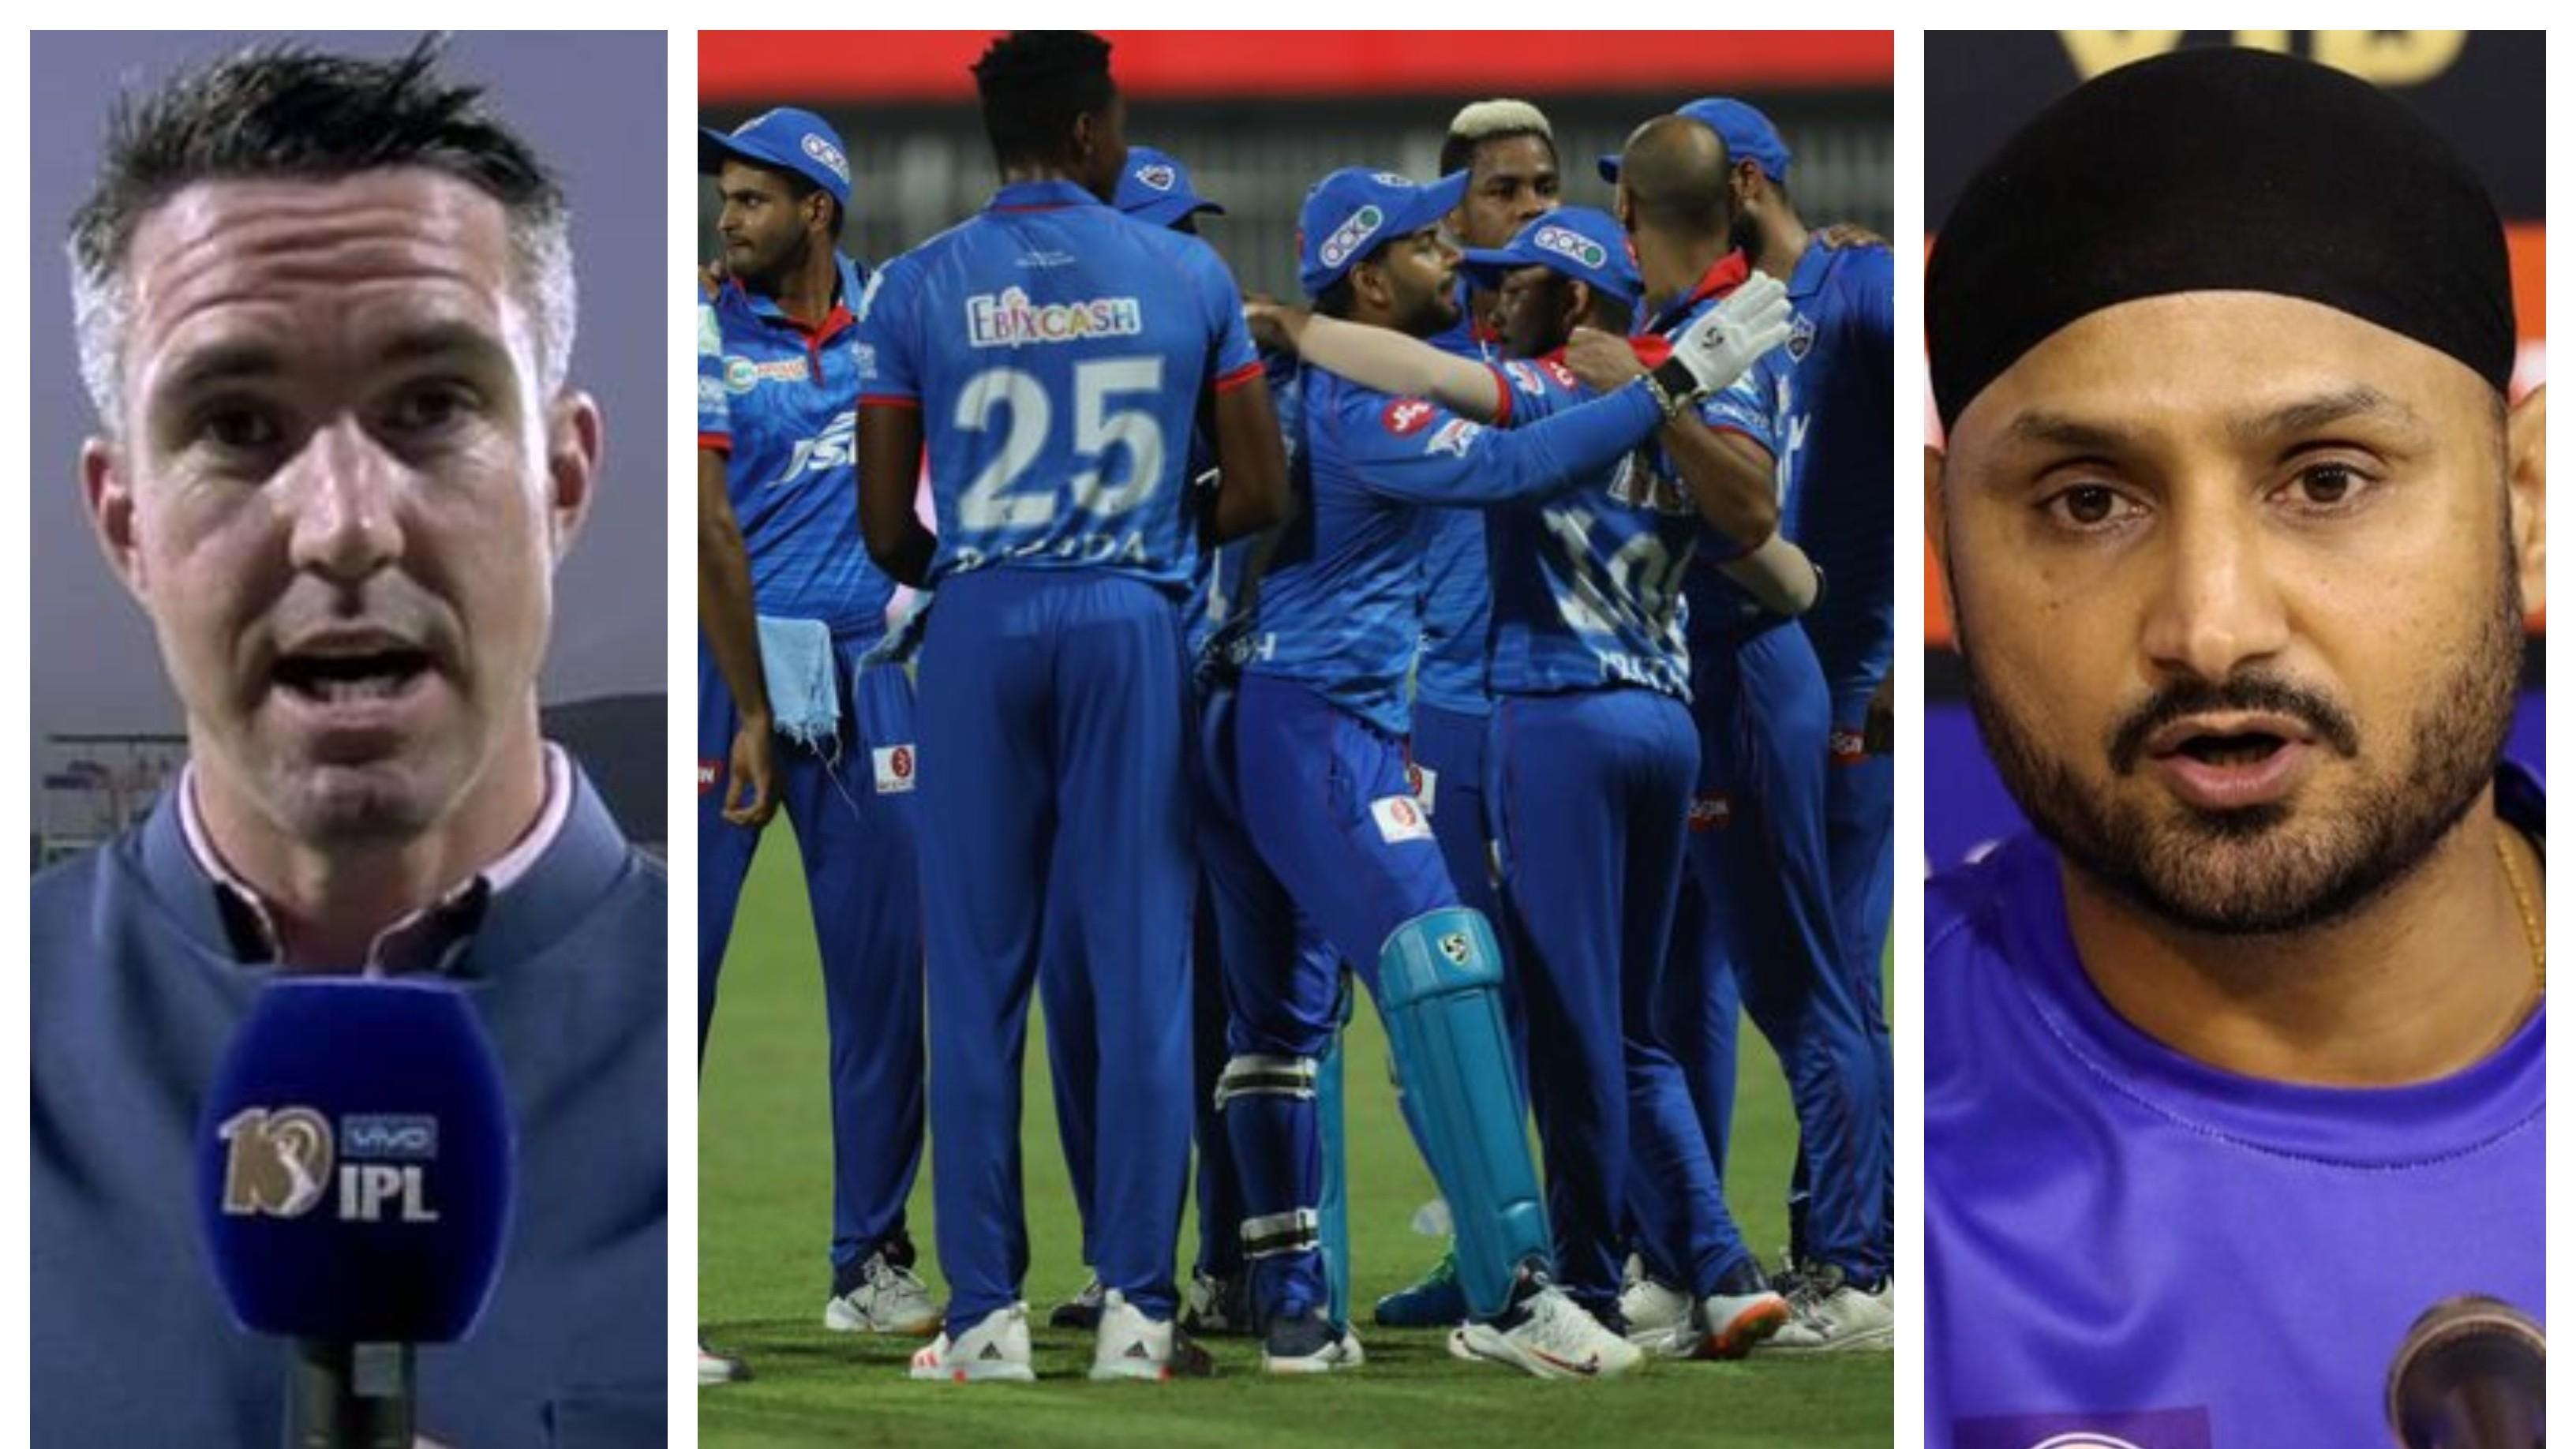 IPL 2020: Cricket fraternity reacts as all-round Delhi Capitals thrash Rajasthan Royals by 46 runs